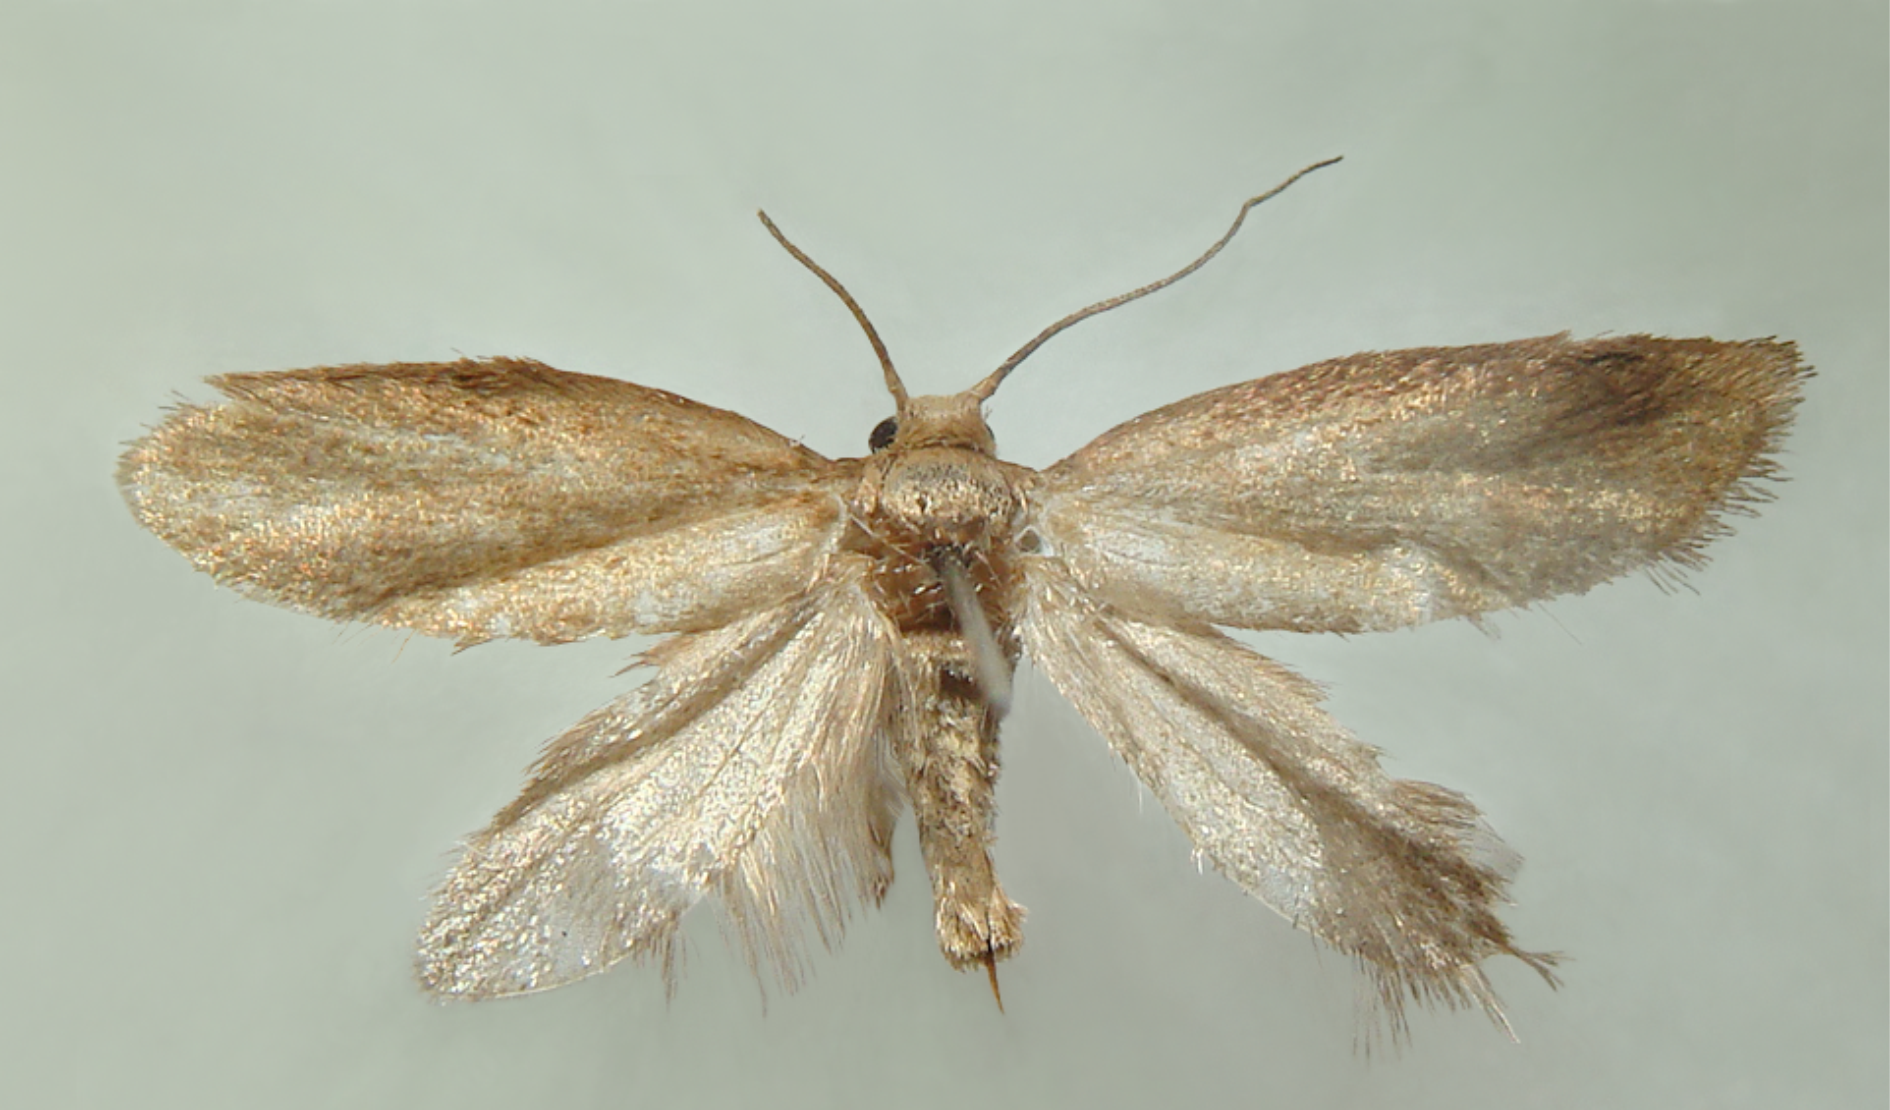 Female of the New Gall-Inducing Moth, <i>Cecidonius pampeanus</i>